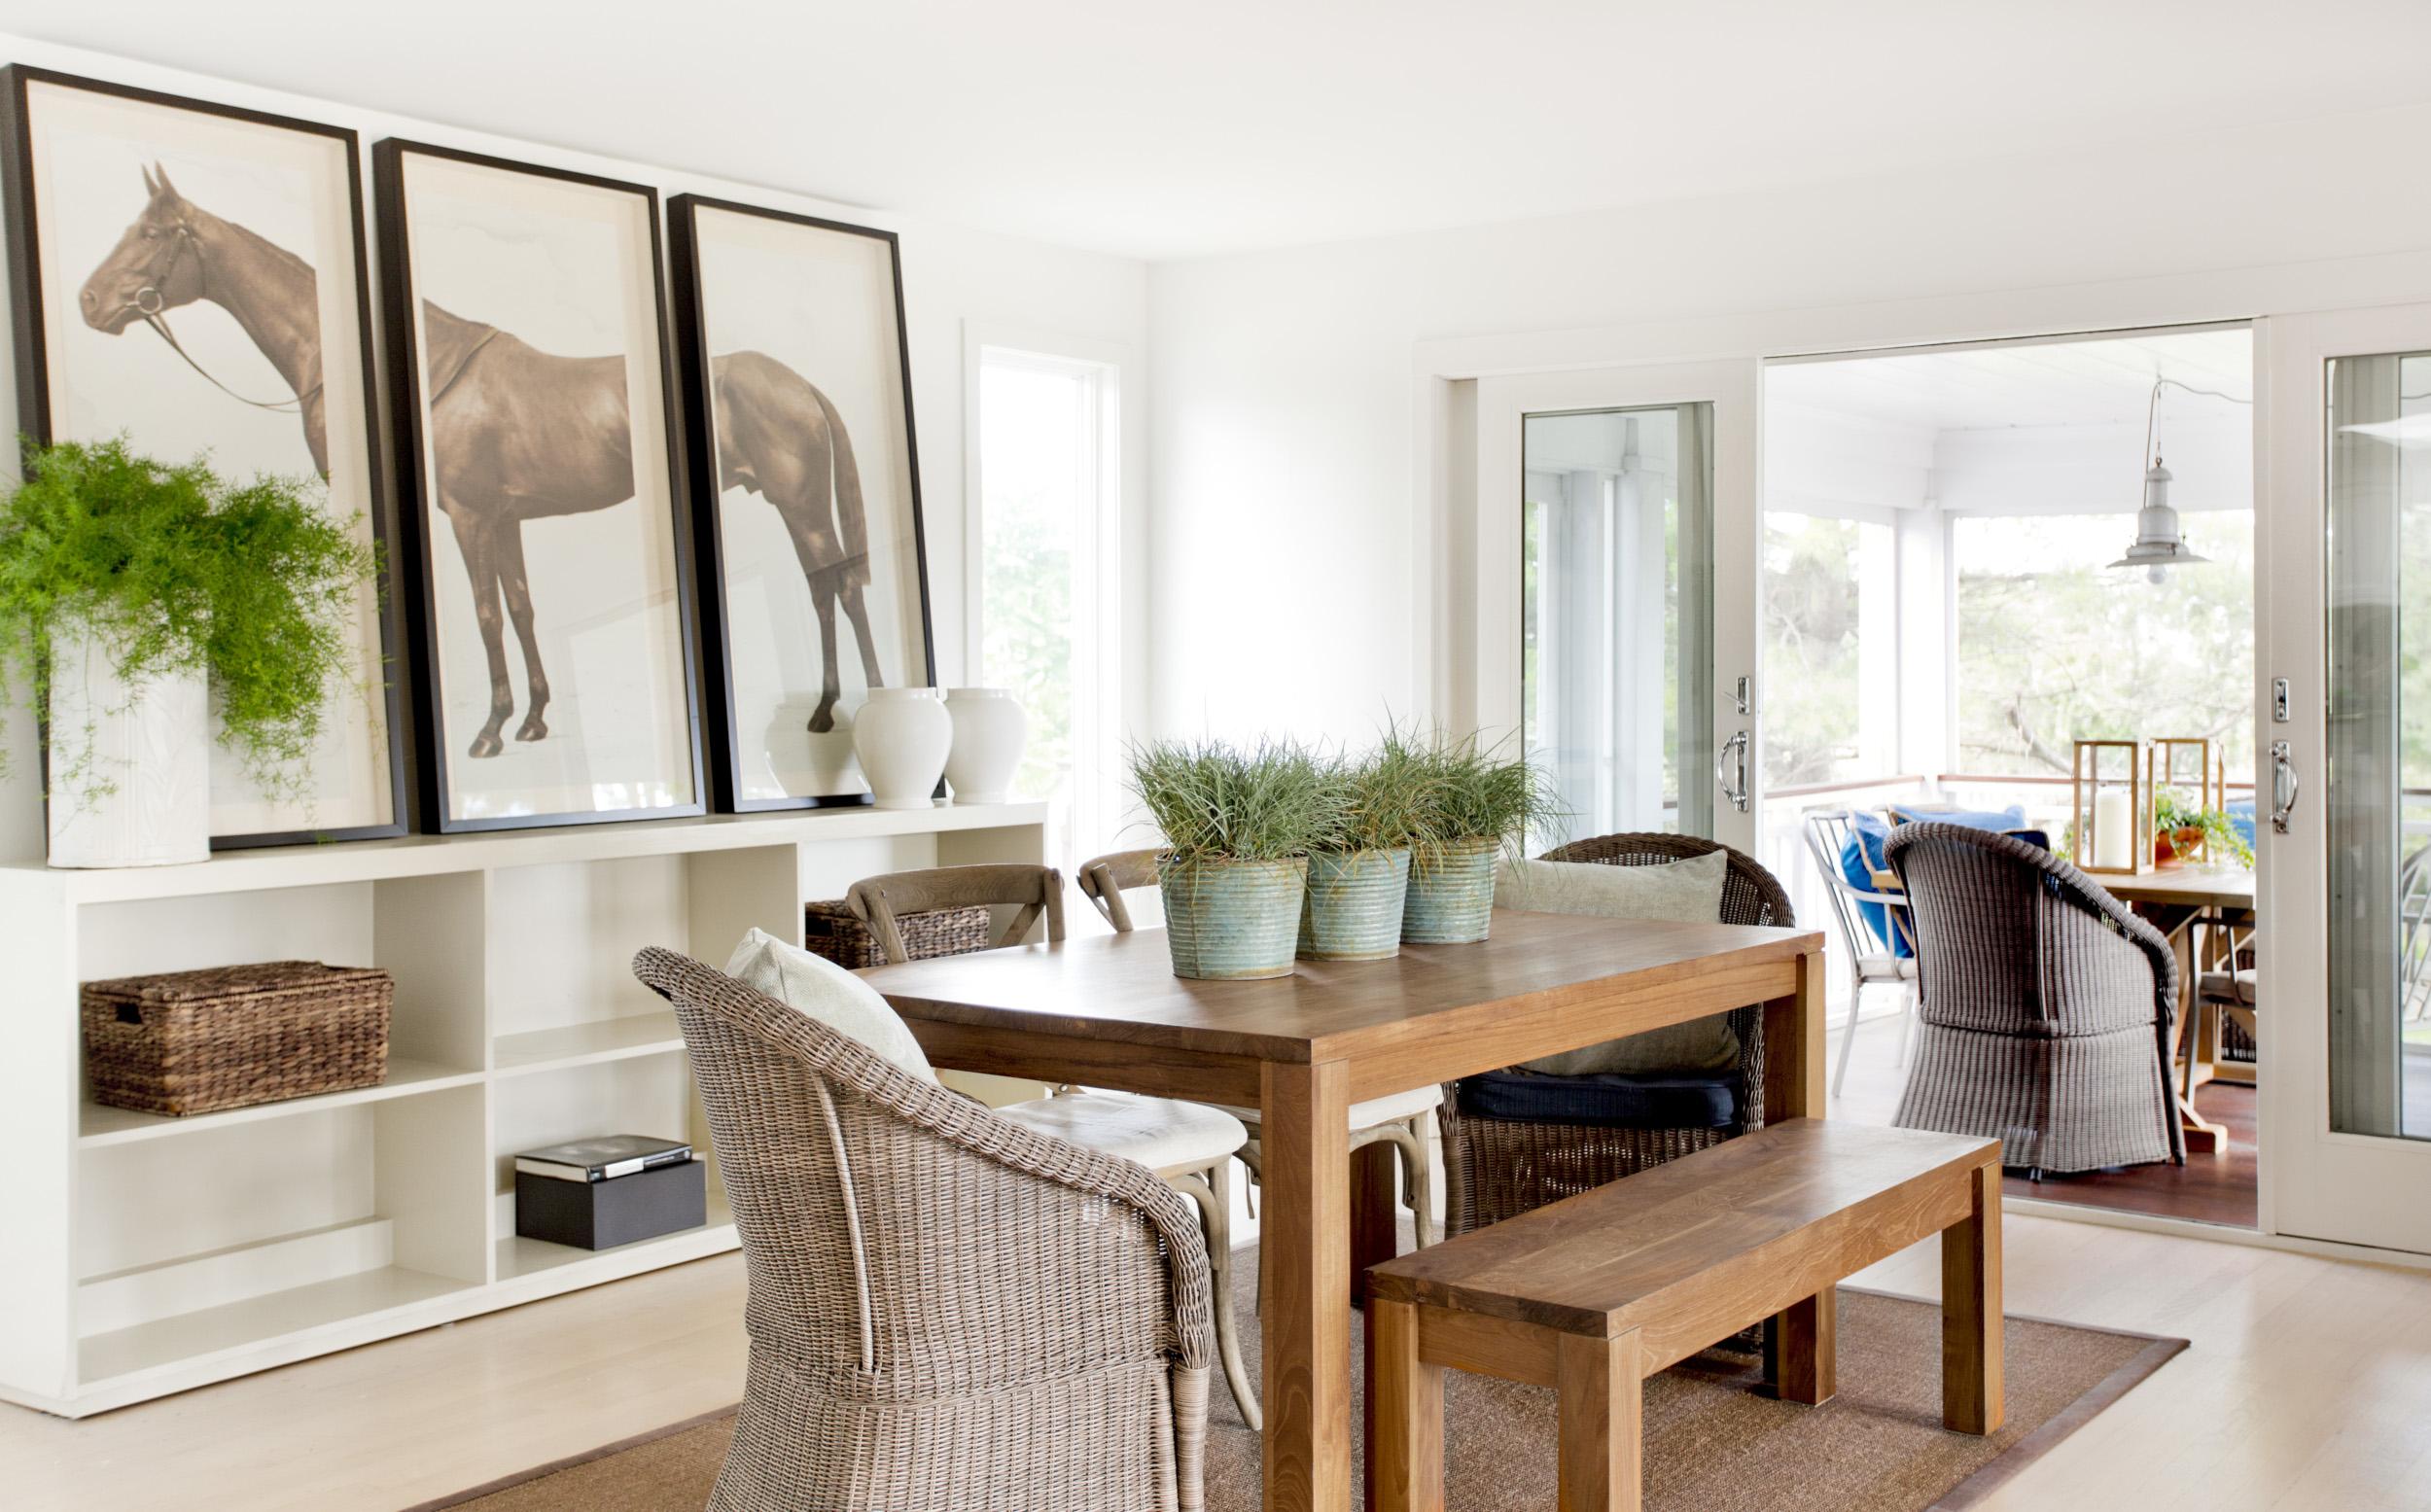 Westport, Connecticut — Caroline Kopp Interior Design